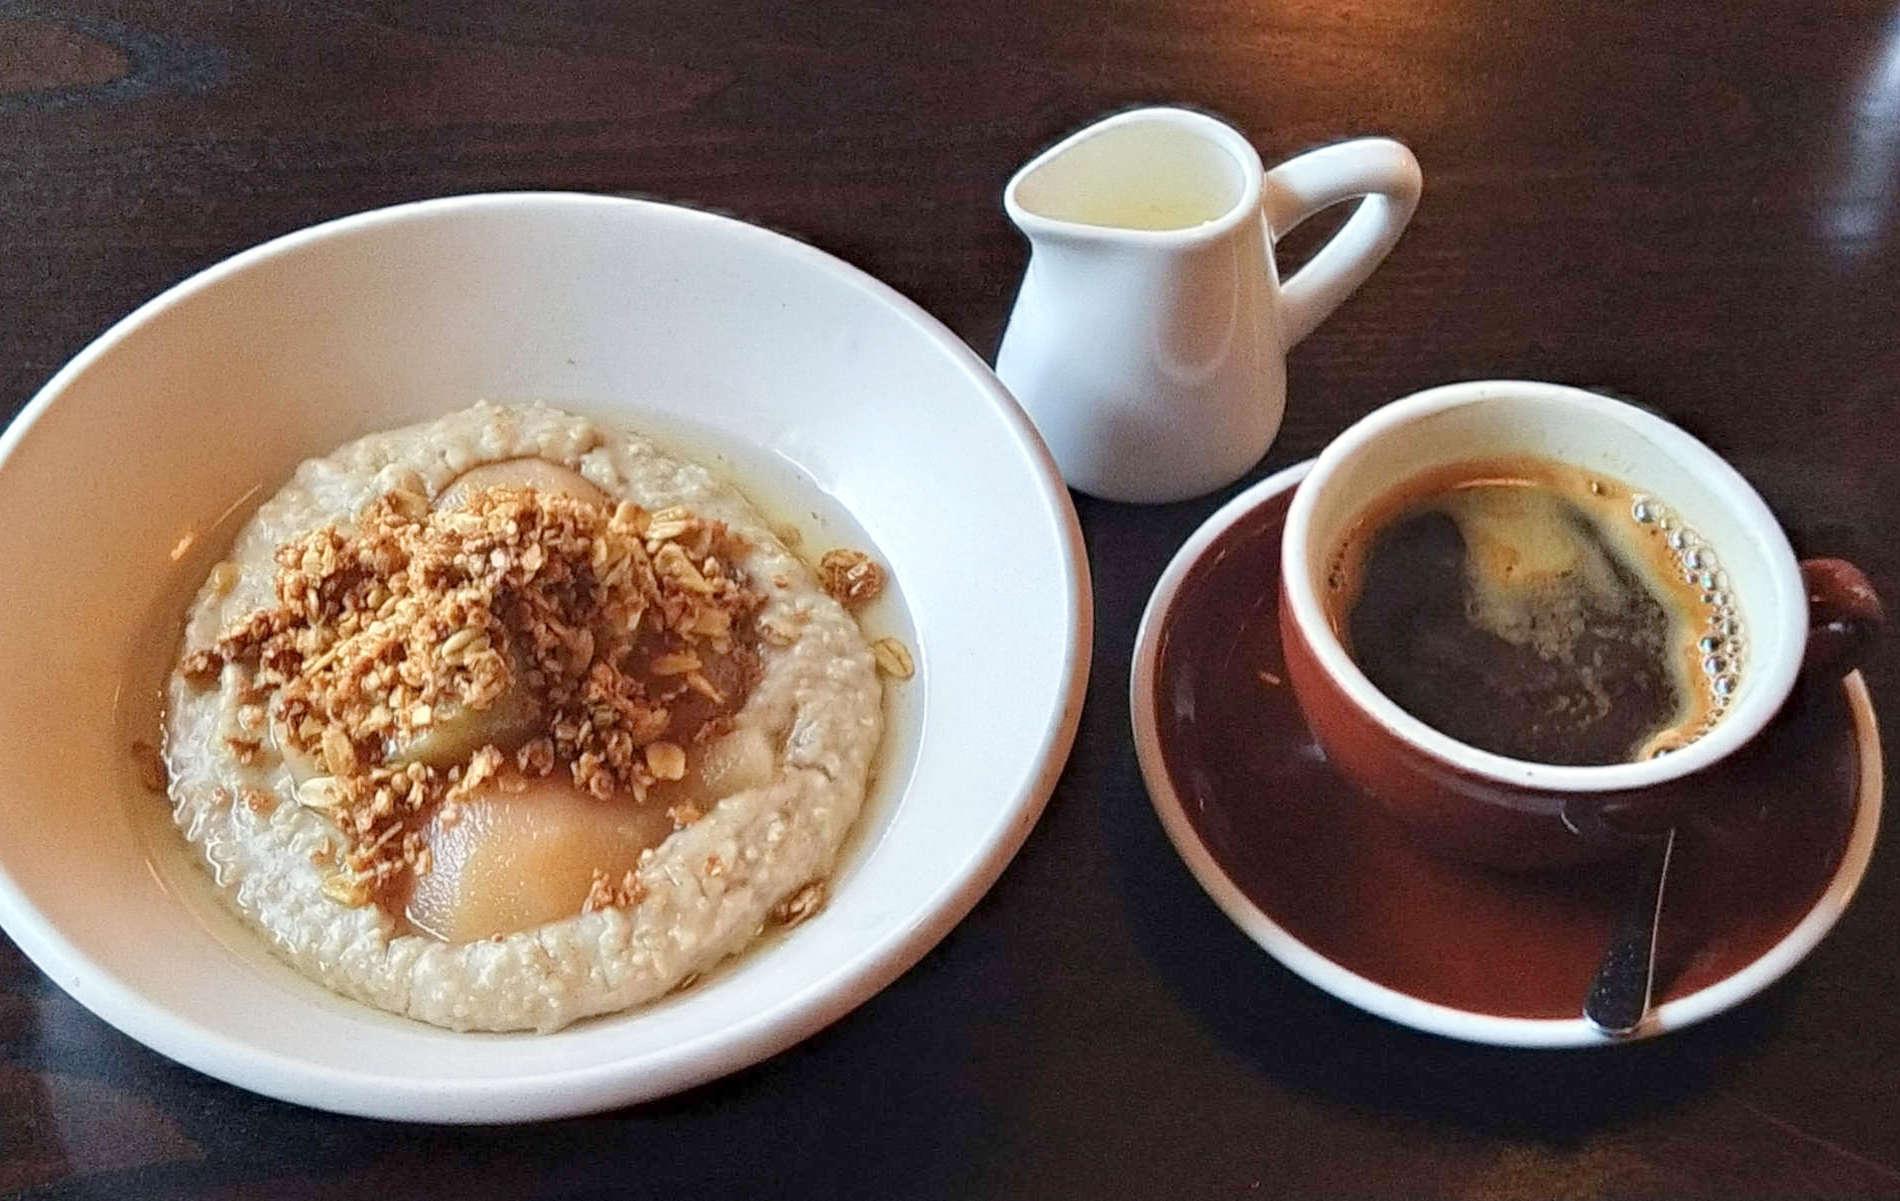 Floriditas - porridge and coffee